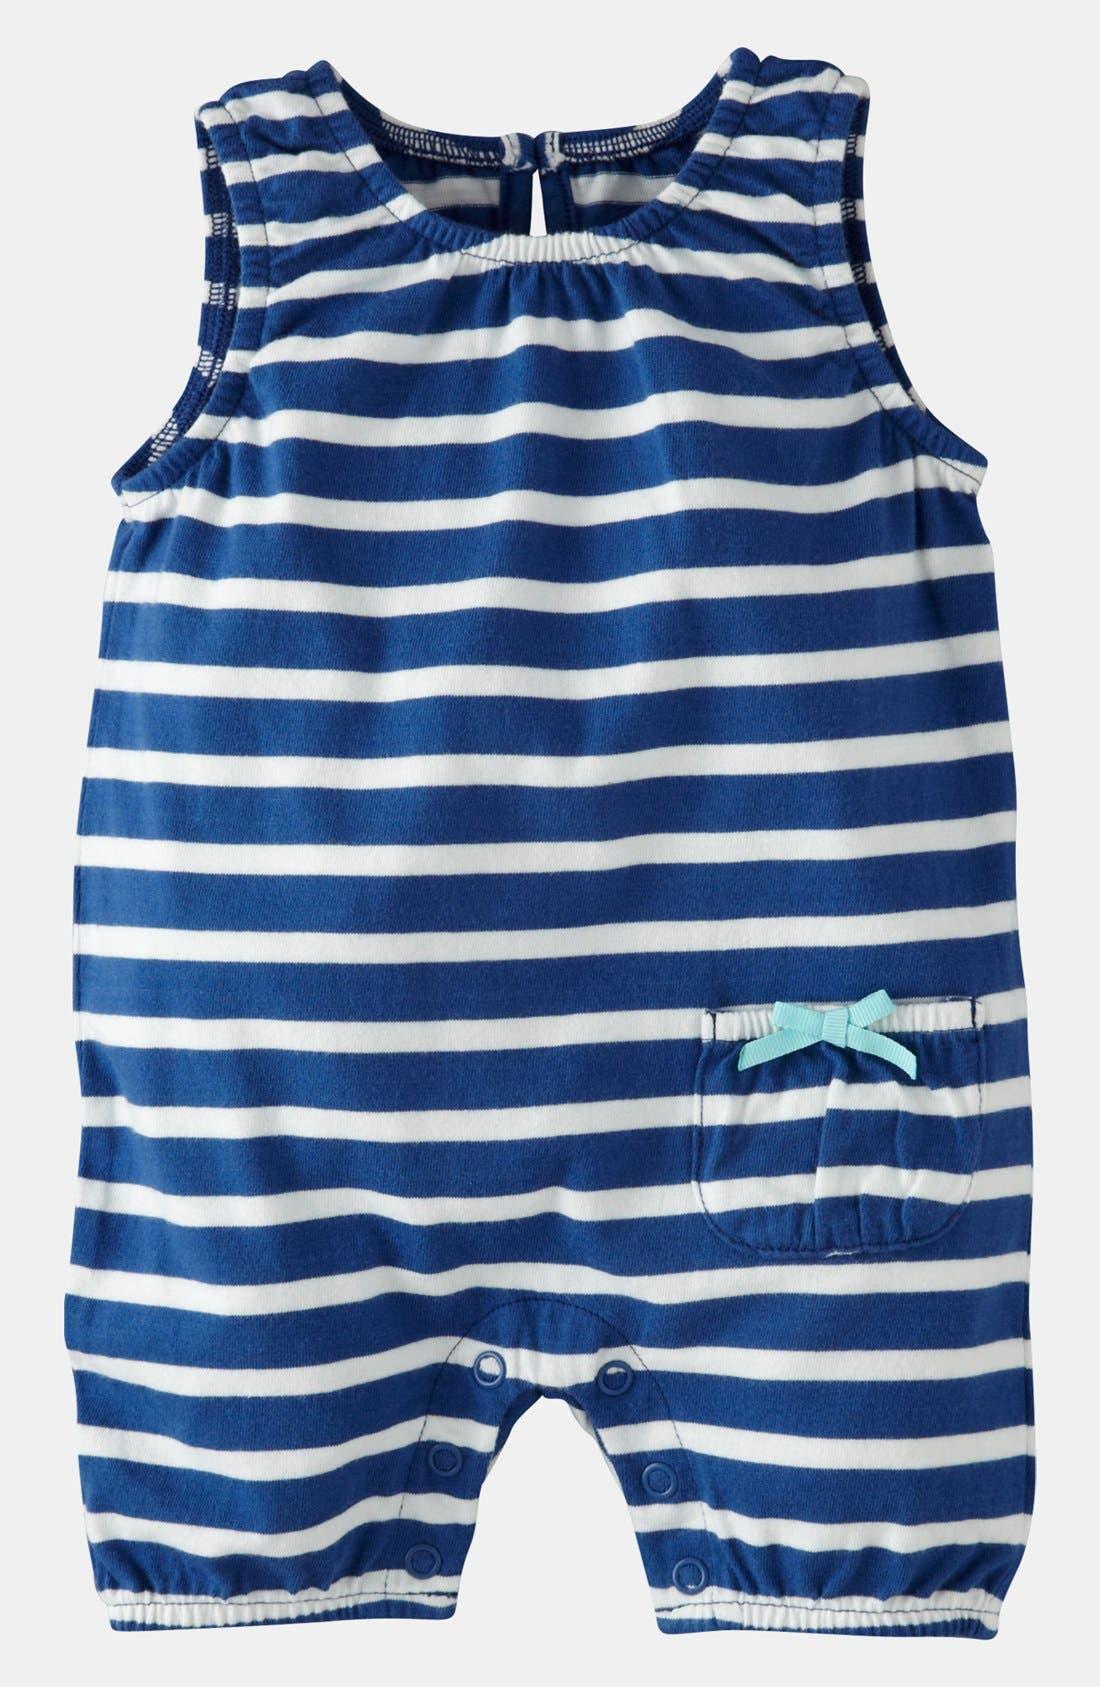 Alternate Image 1 Selected - Mini Boden 'Pretty' Jersey Coveralls (Baby)